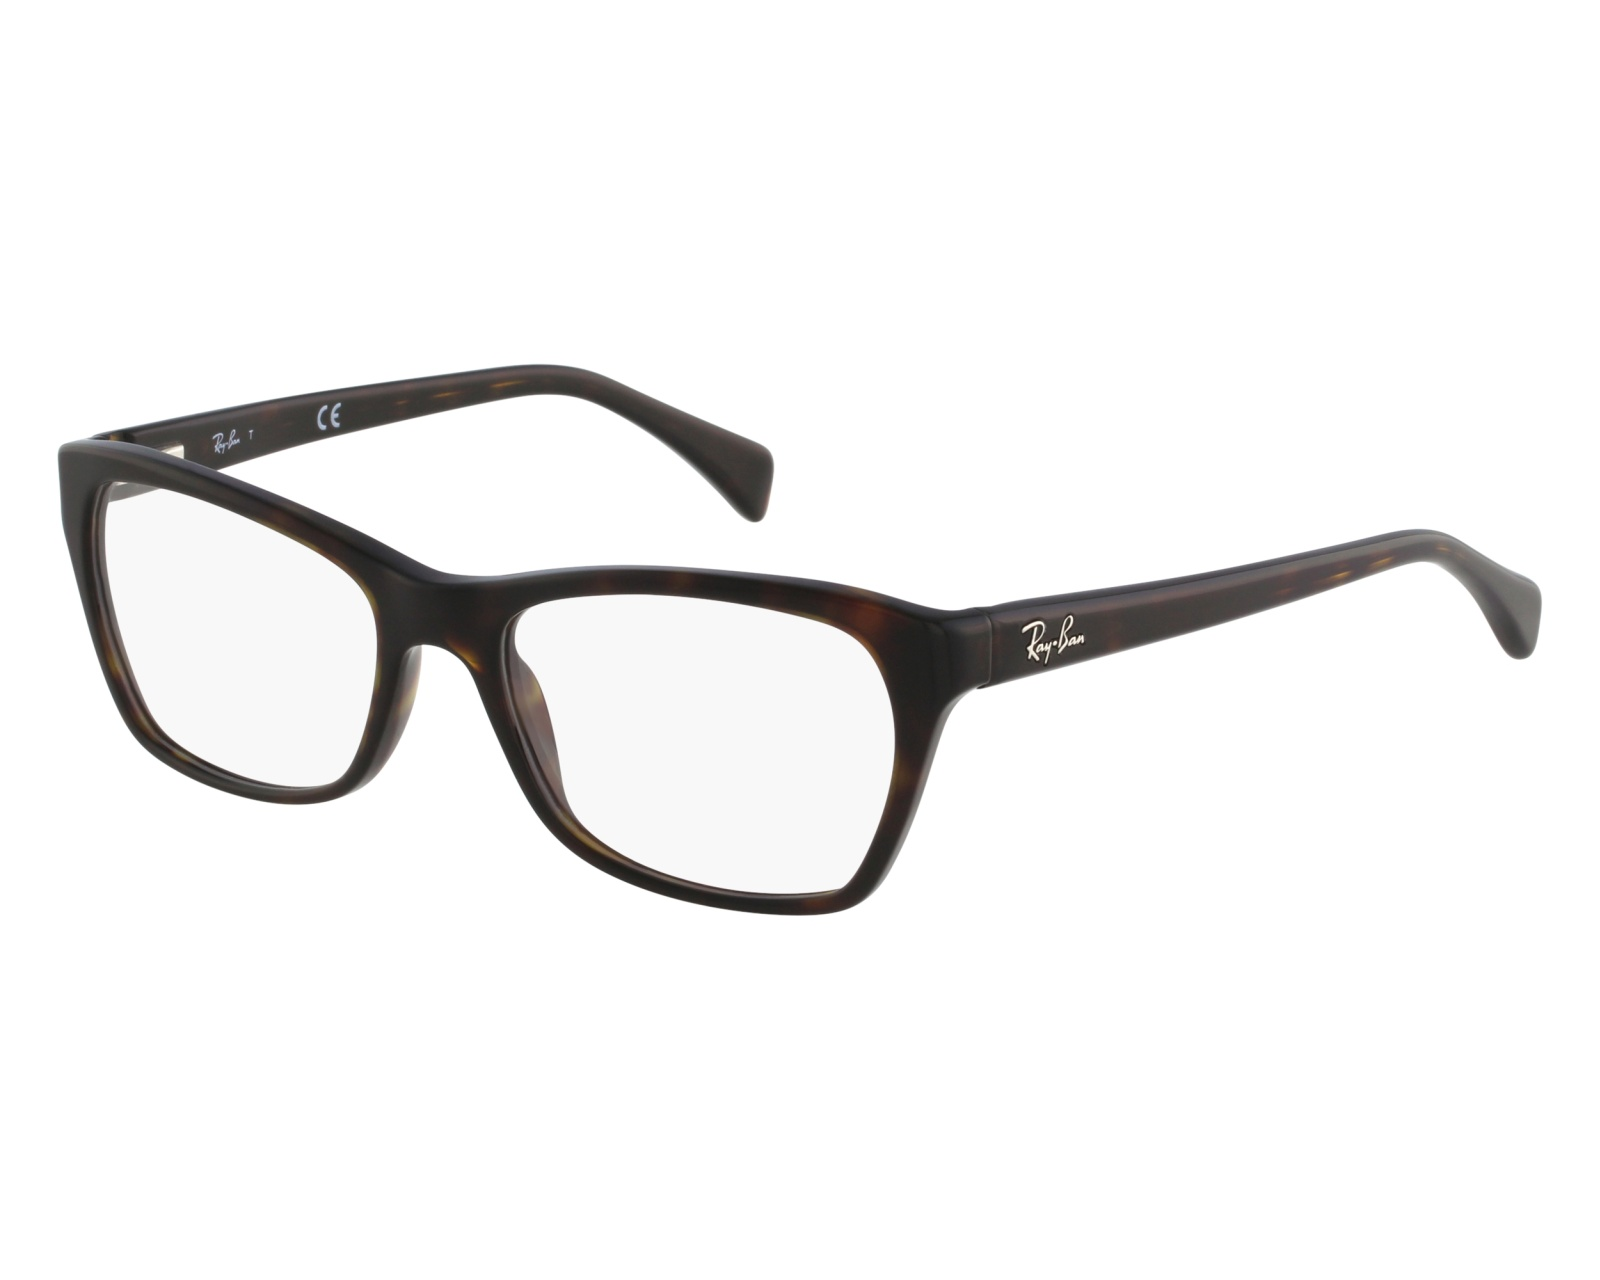 c3097177e6 eyeglasses Ray-Ban RX-5298 2012 53-17 Havana front view